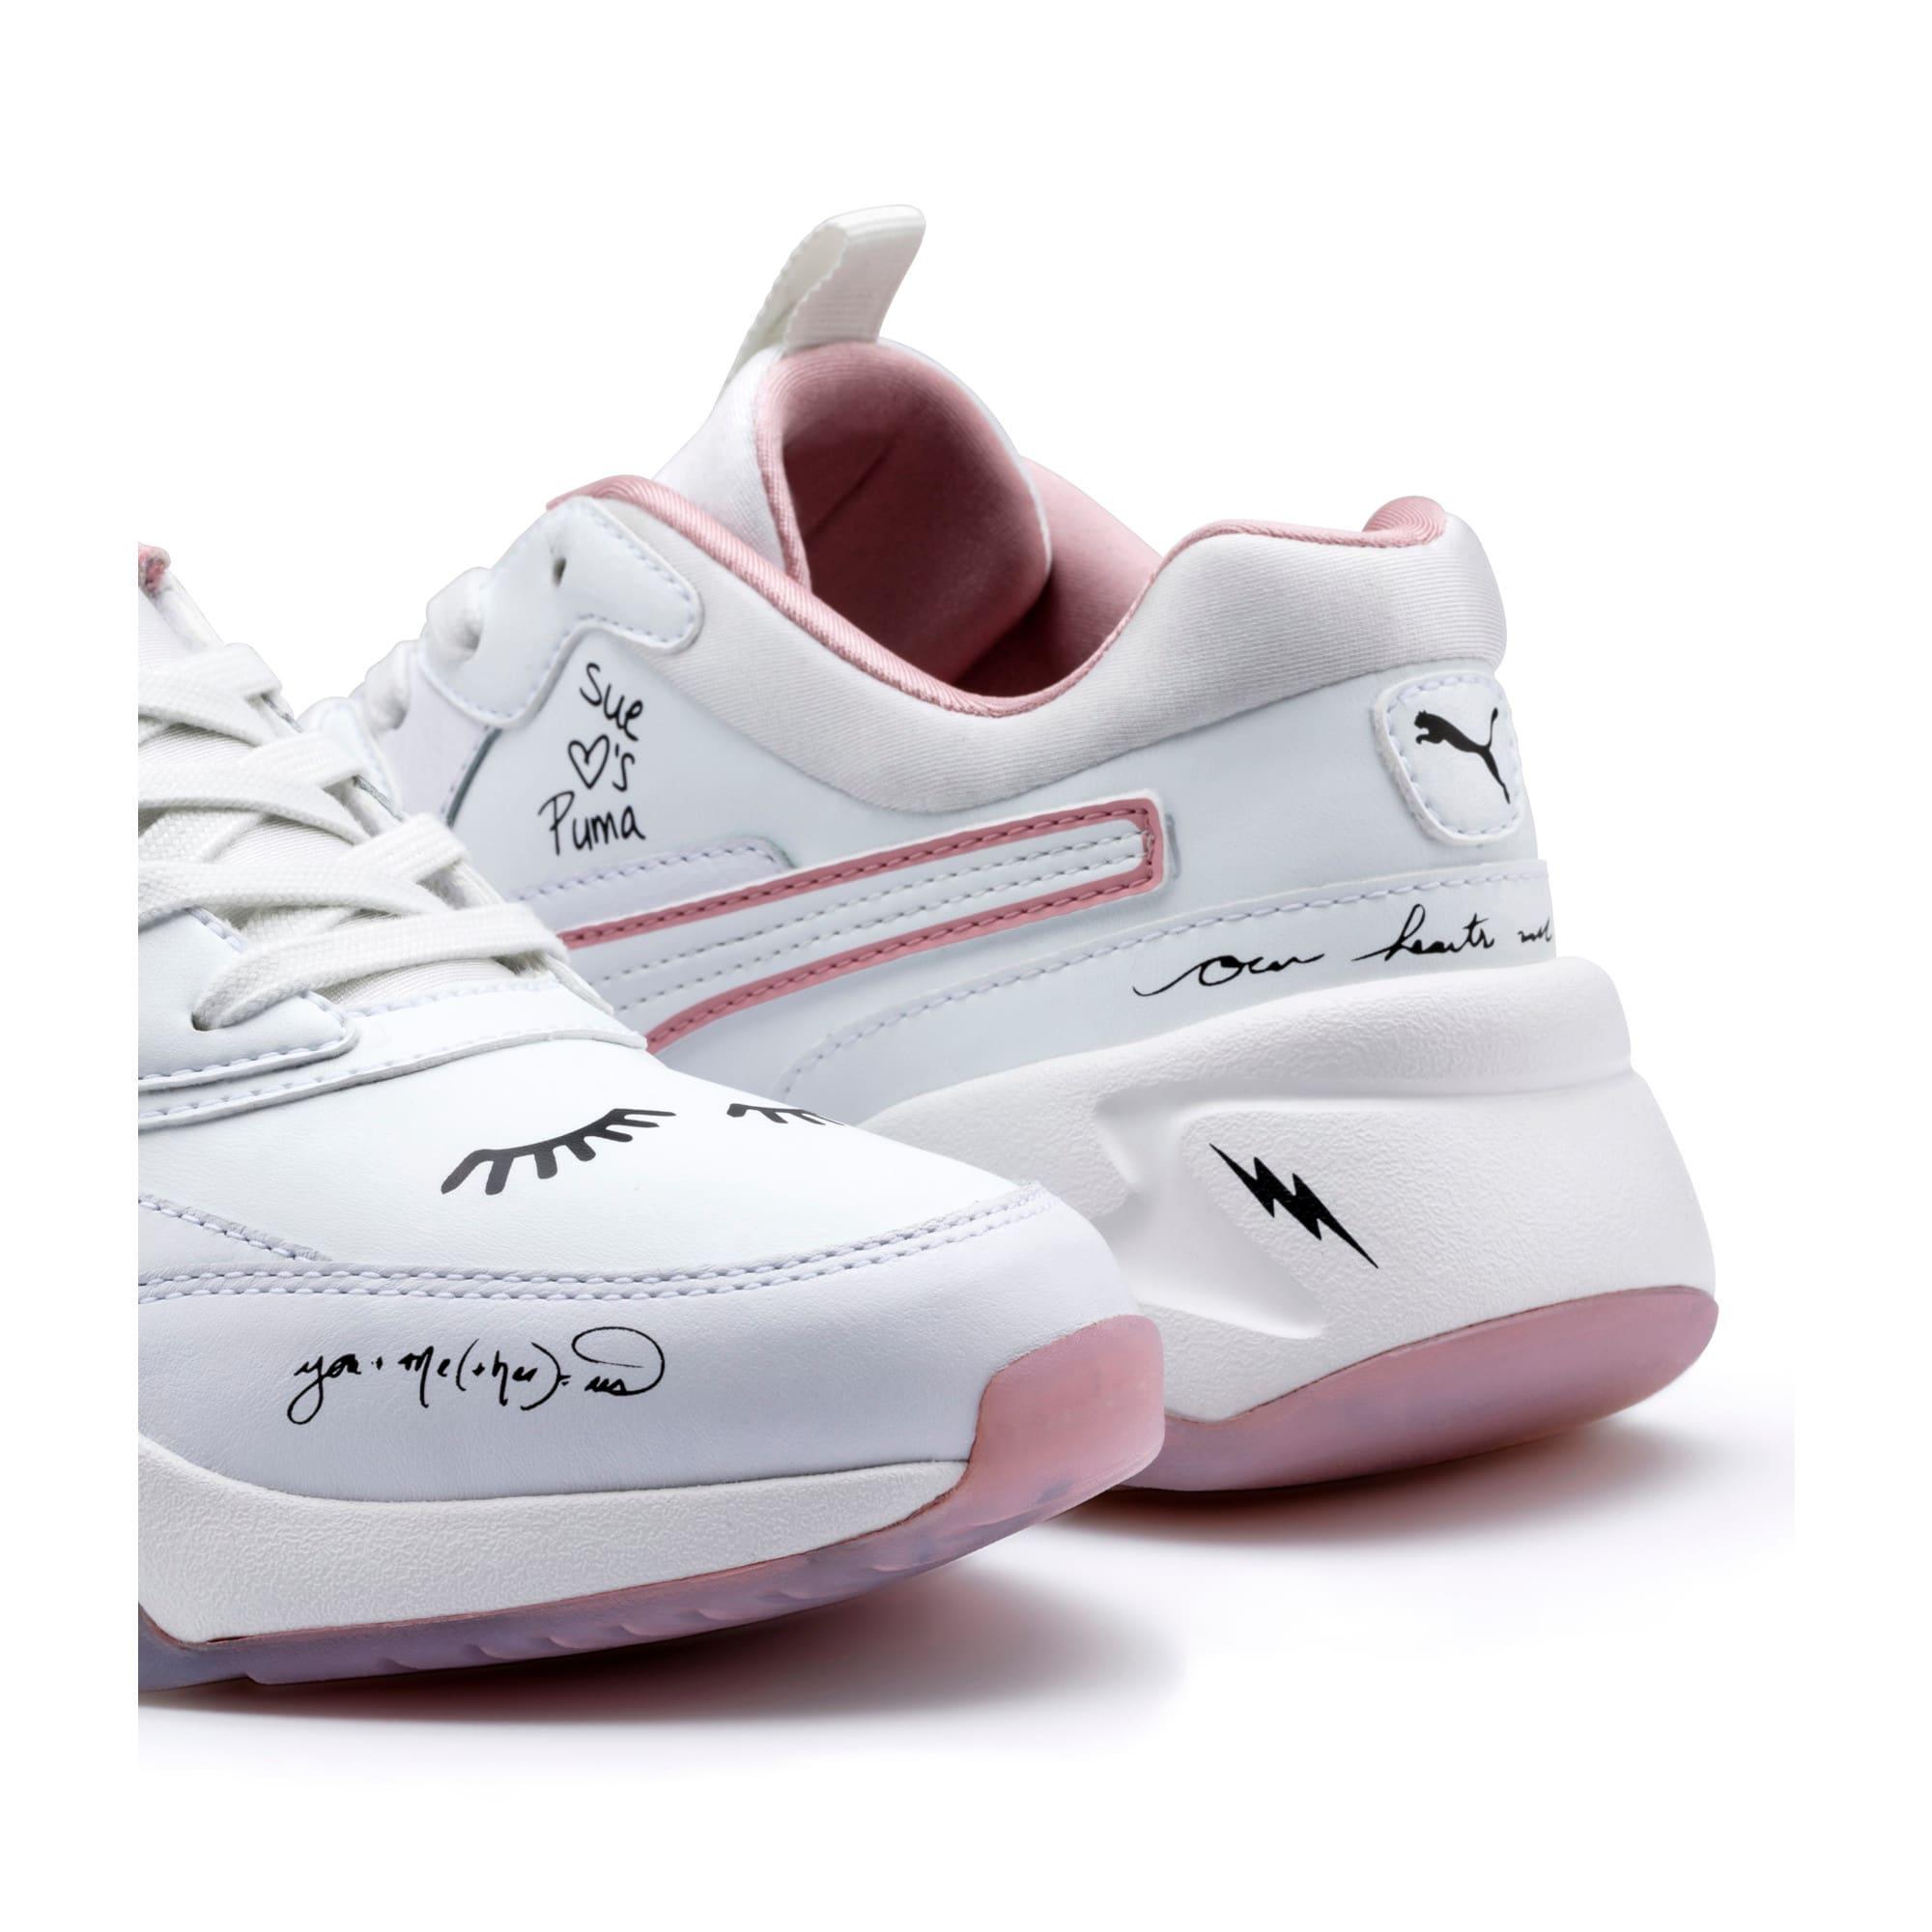 Thumbnail 9 of PUMA x SUE TSAI Nova Women's Sneakers, Bright White-Bright White, medium